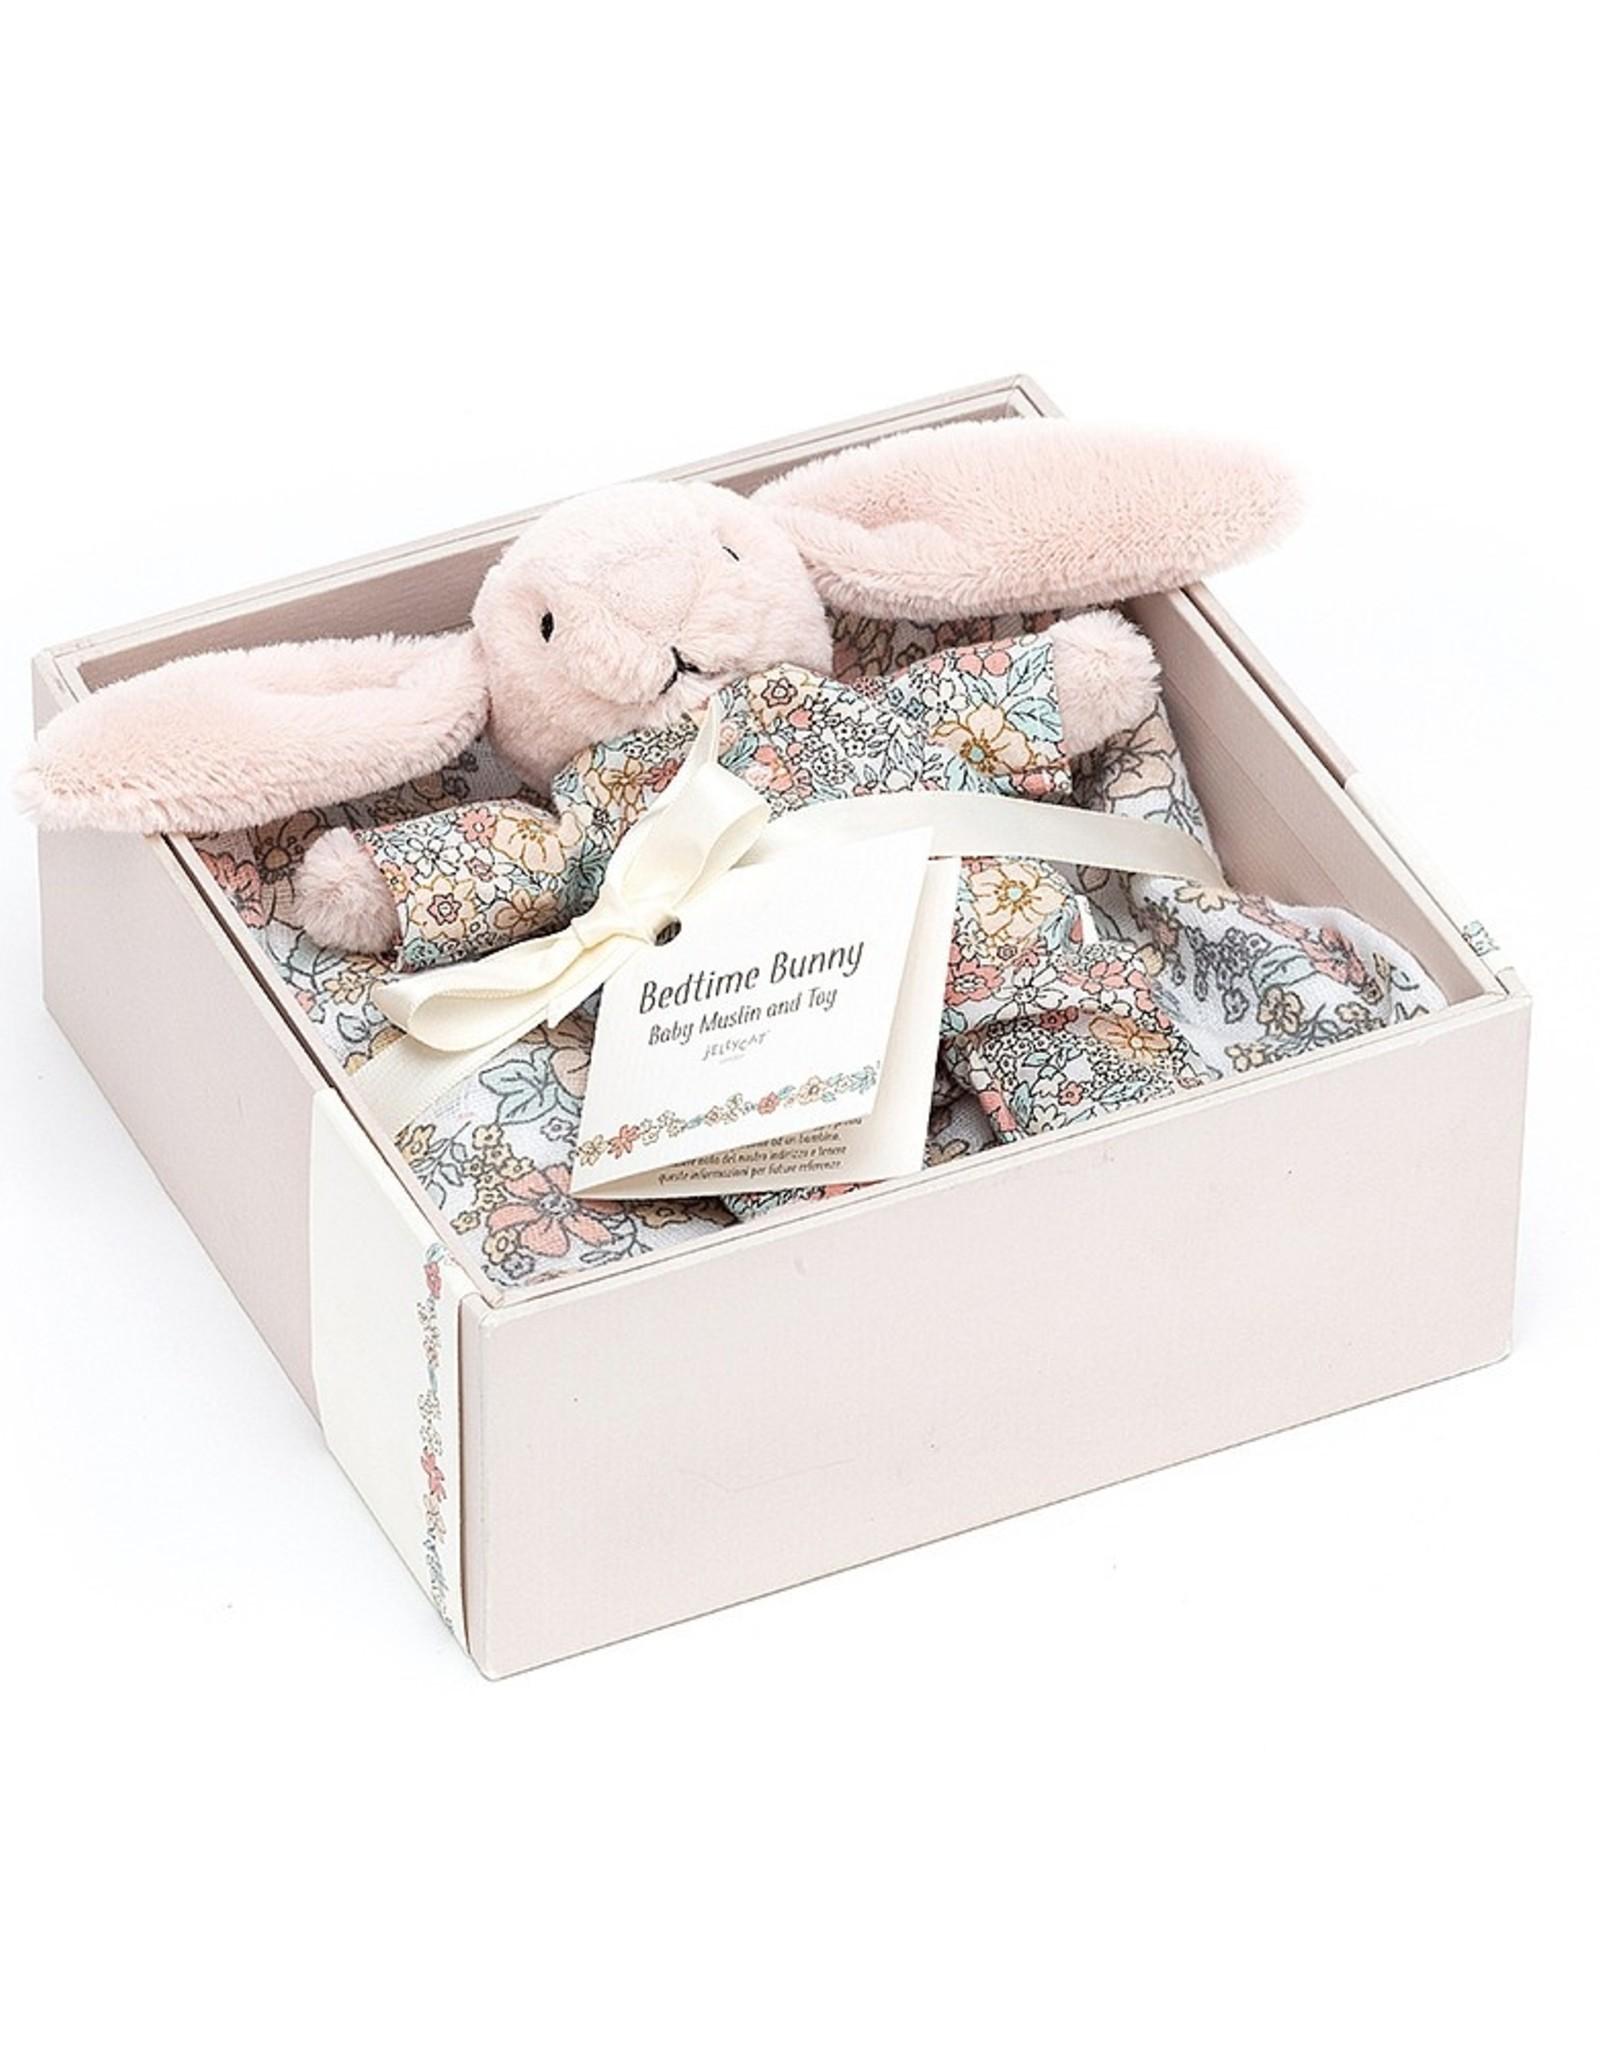 Jelly Cat Bedtime Blossom Bunny Muslin & Toy Set